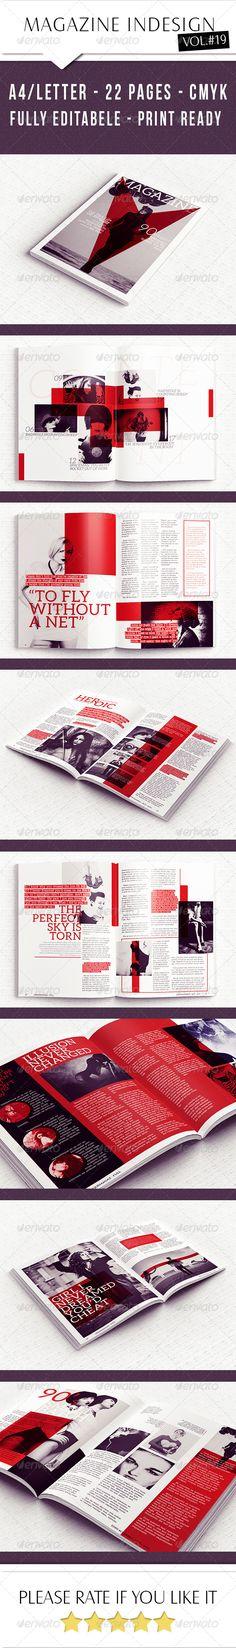 Elegant Magazine Template - Magazines Print Templates